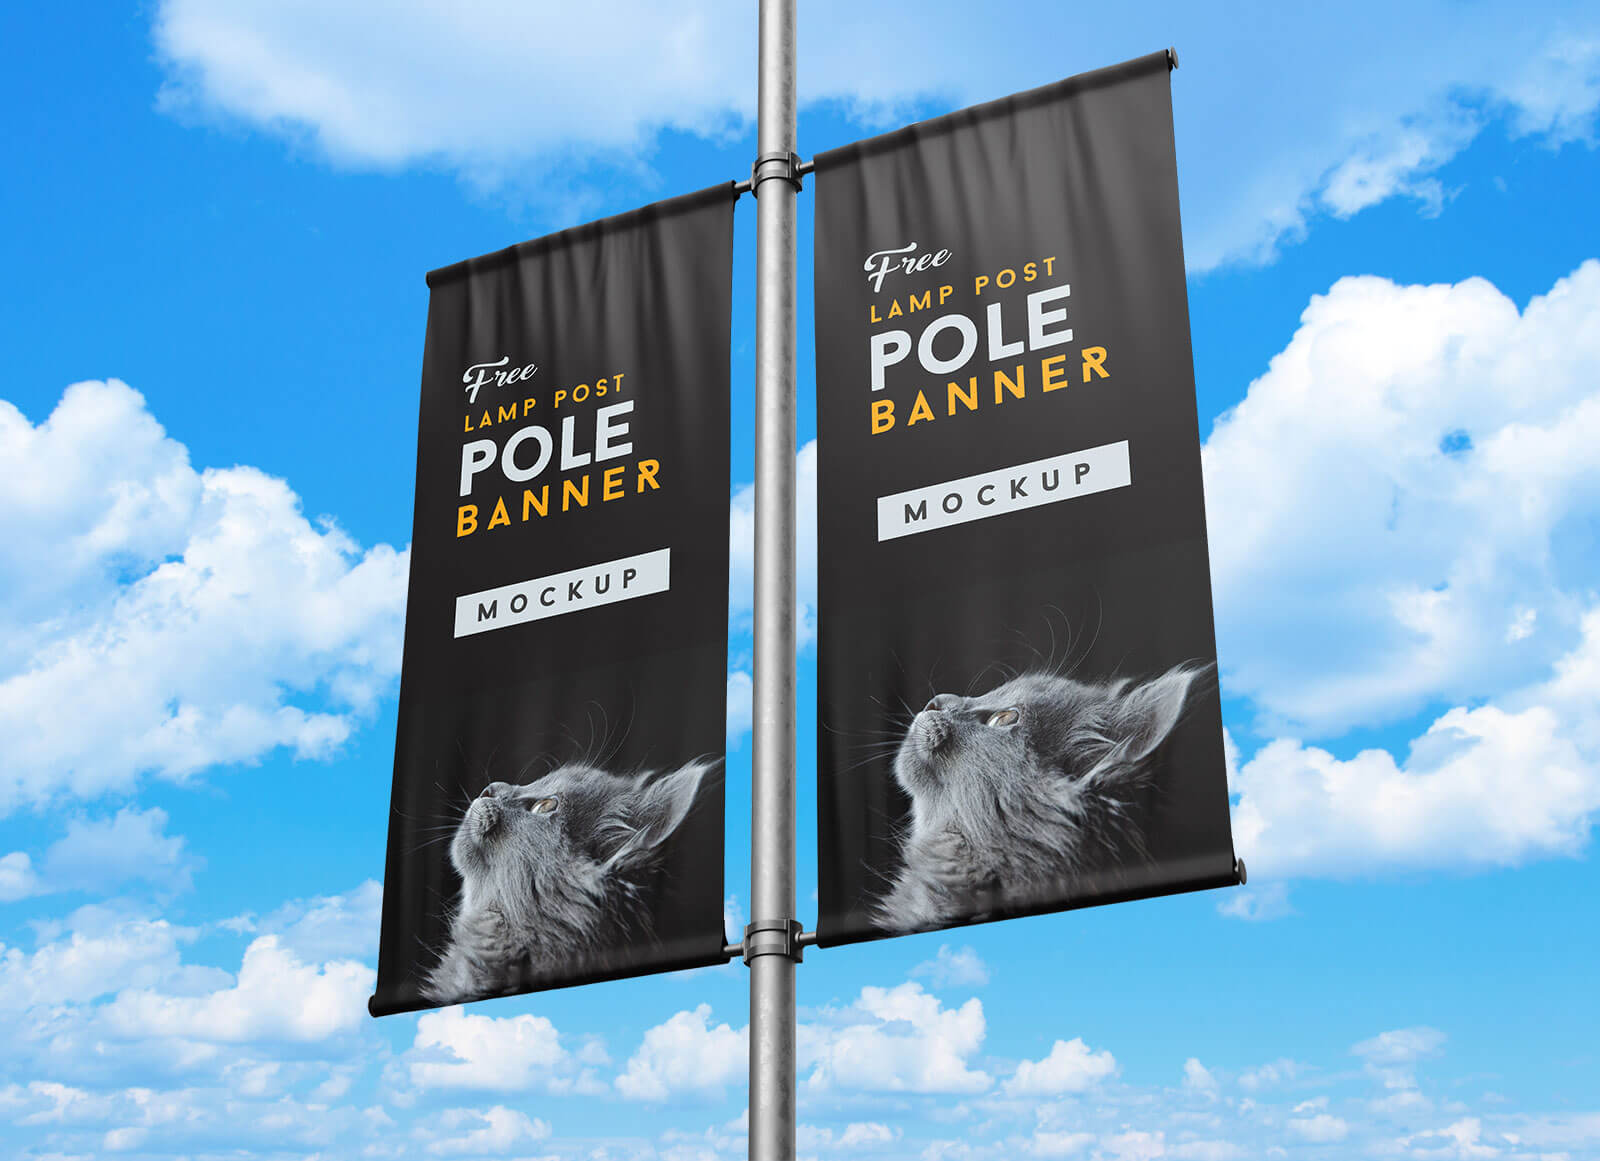 Free-Outdoor-Advertising-Street-Lamp-Post-Pole-Banner-Mockup-PSD-Set-Free (1)